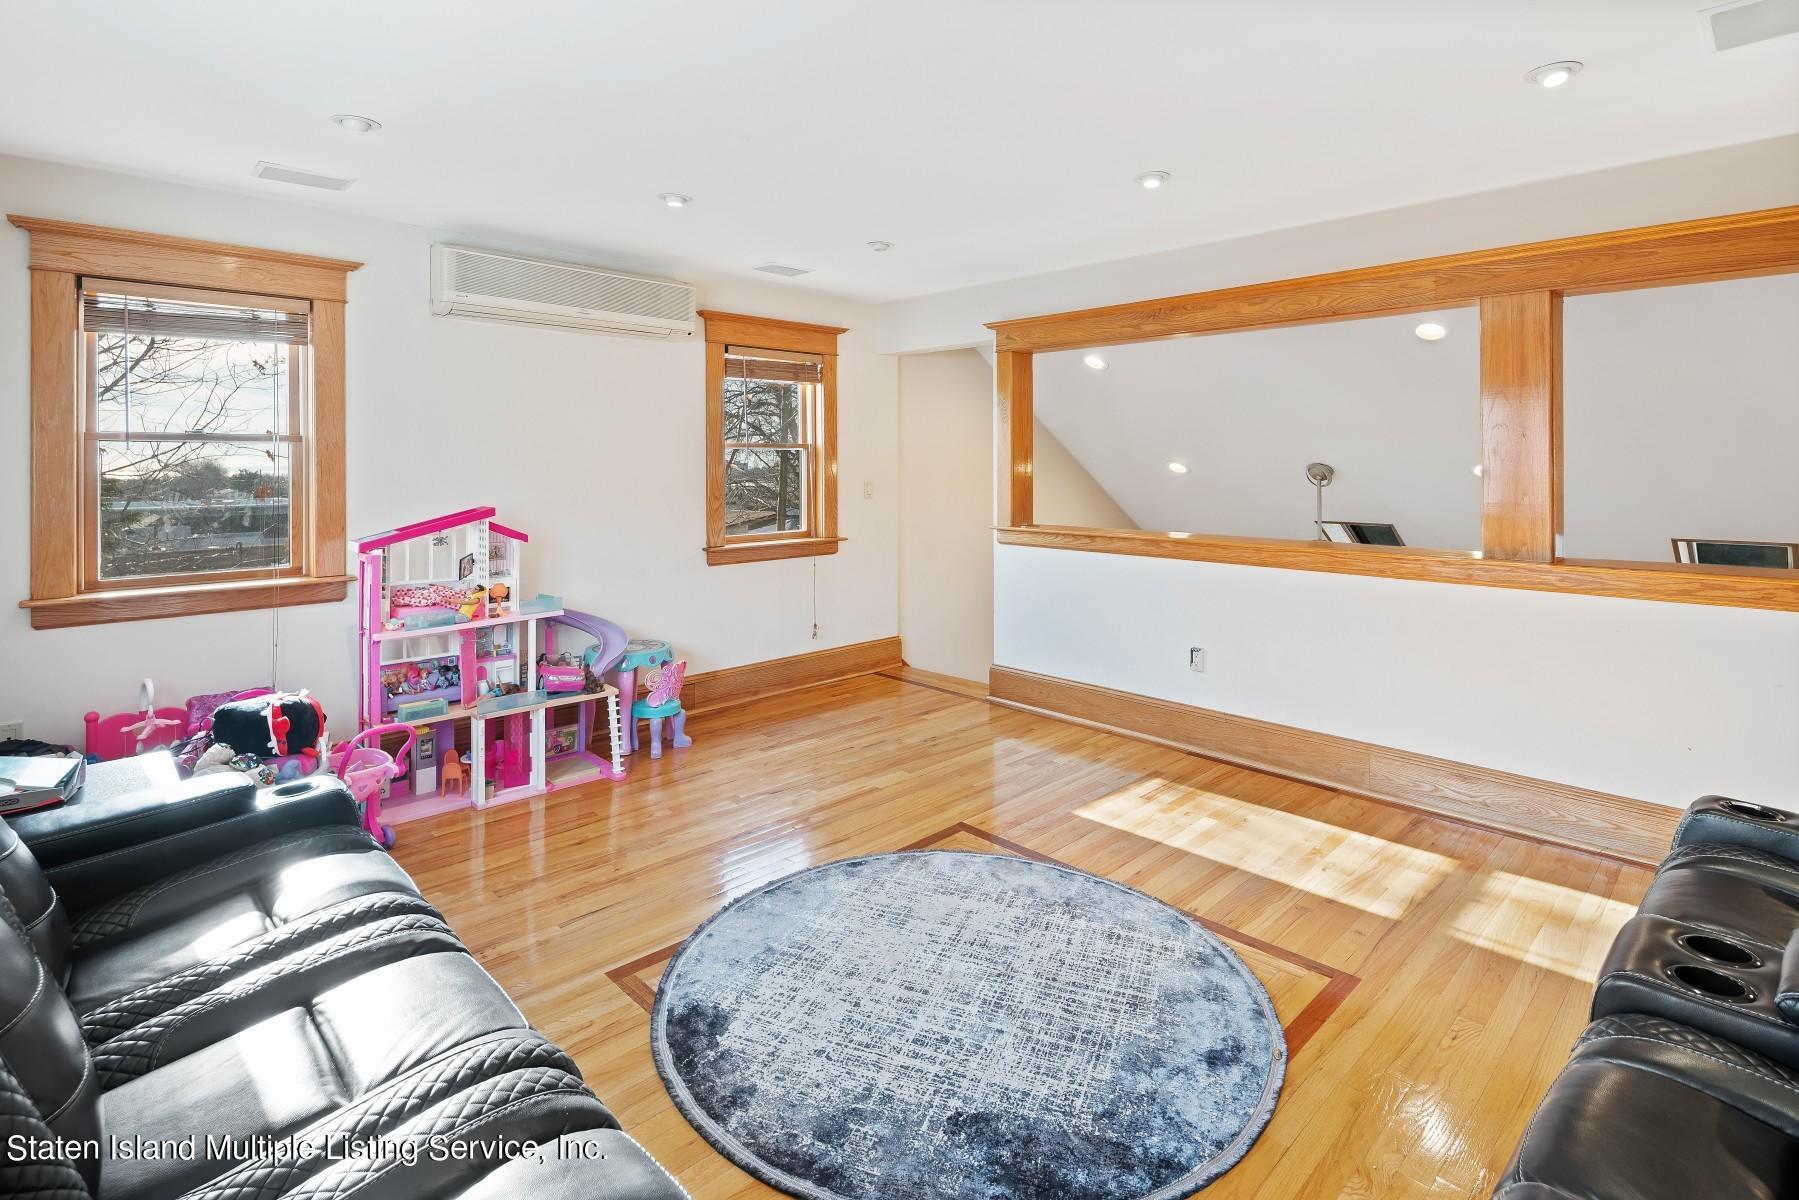 Single Family - Detached 8 Bionia Avenue  Staten Island, NY 10305, MLS-1142818-12